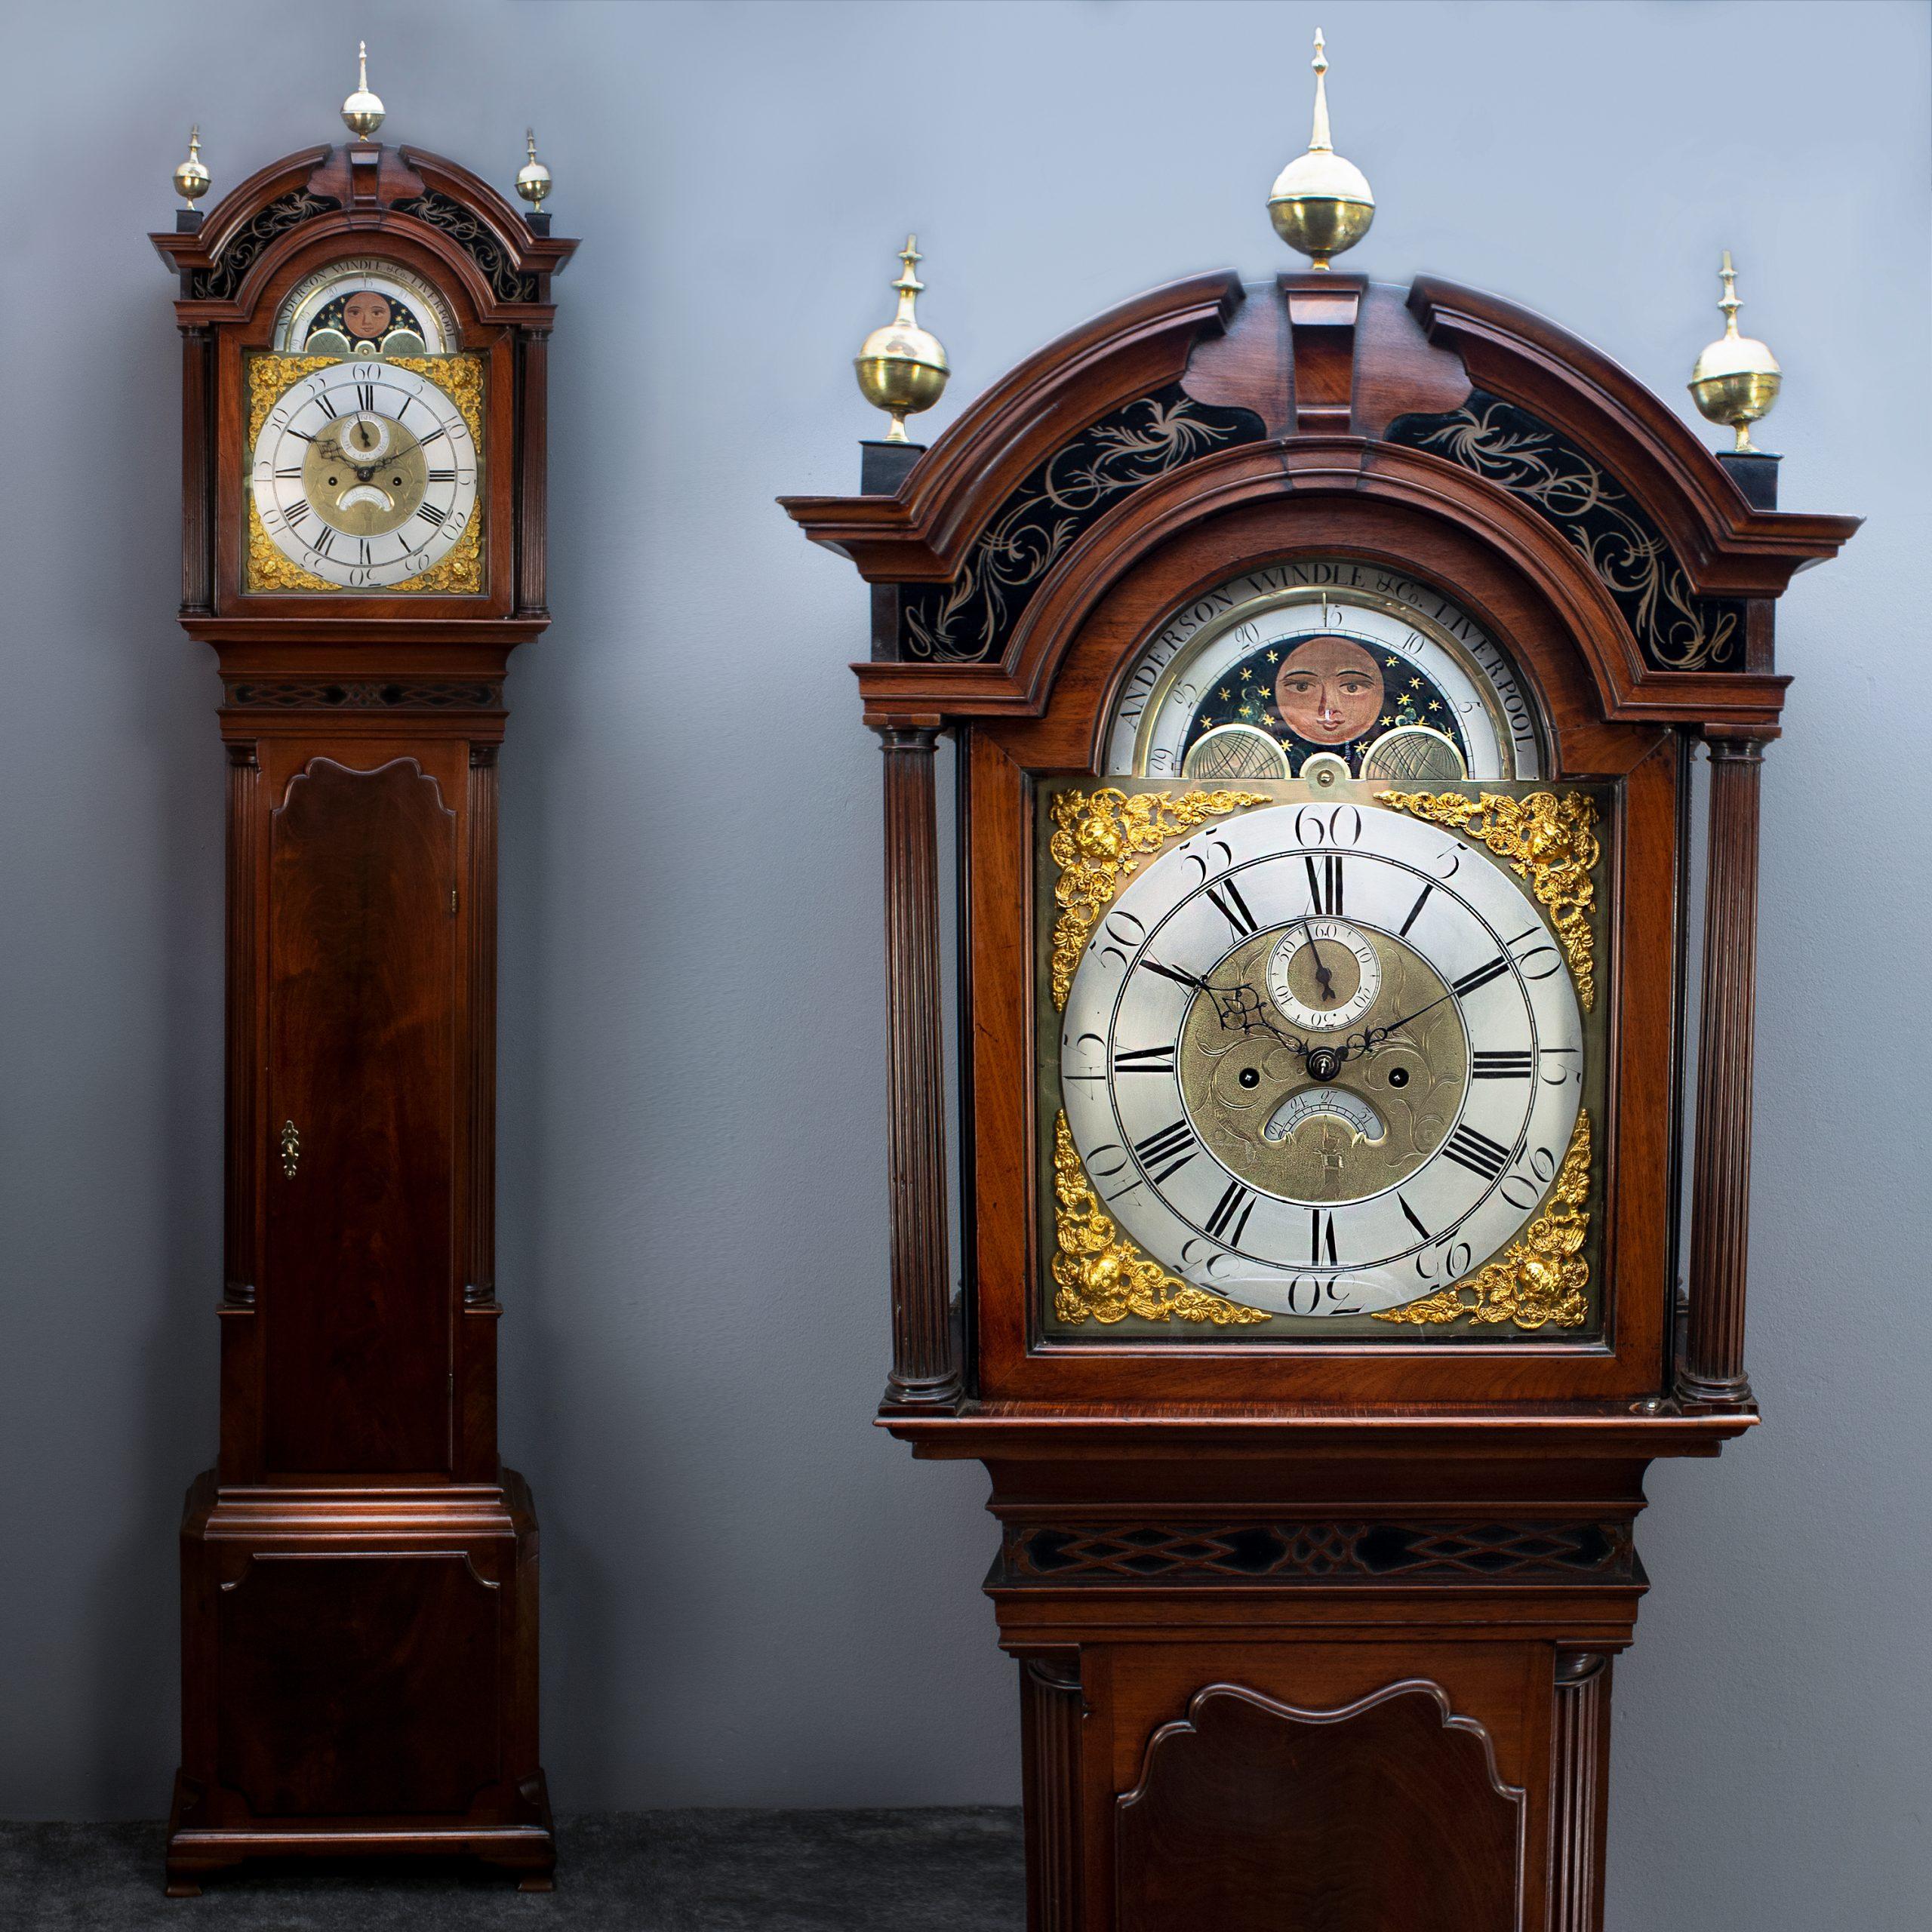 Engelse staande klok met maan en datum